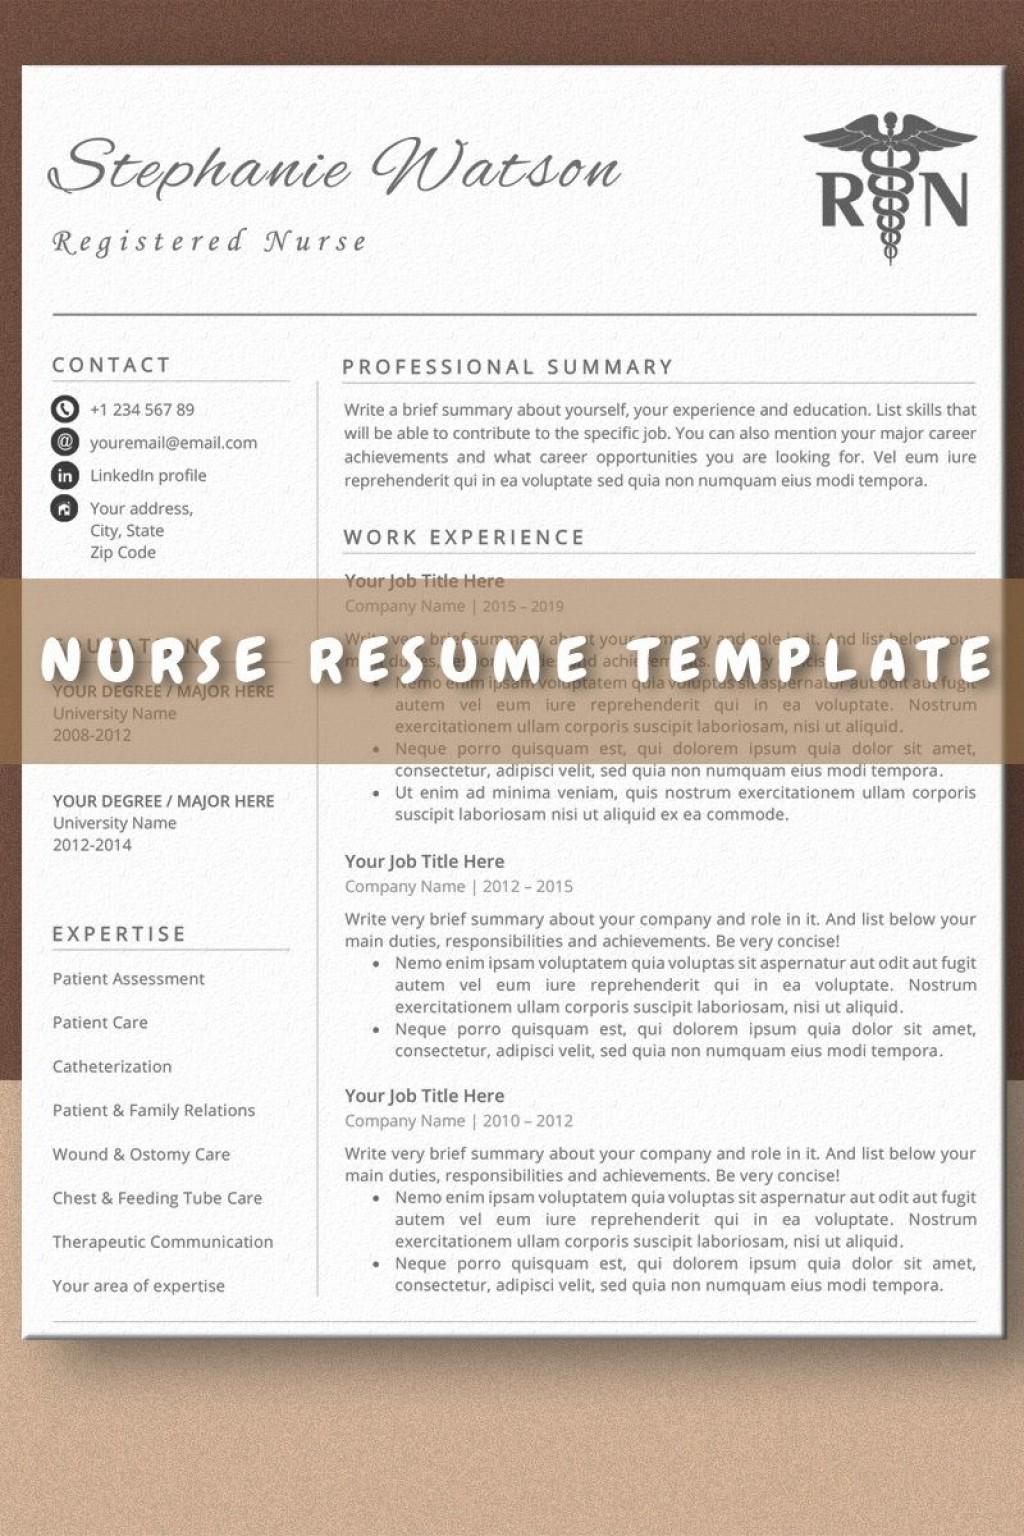 009 Stirring Nurse Resume Template Word Highest Clarity  Cv Free Download RnLarge